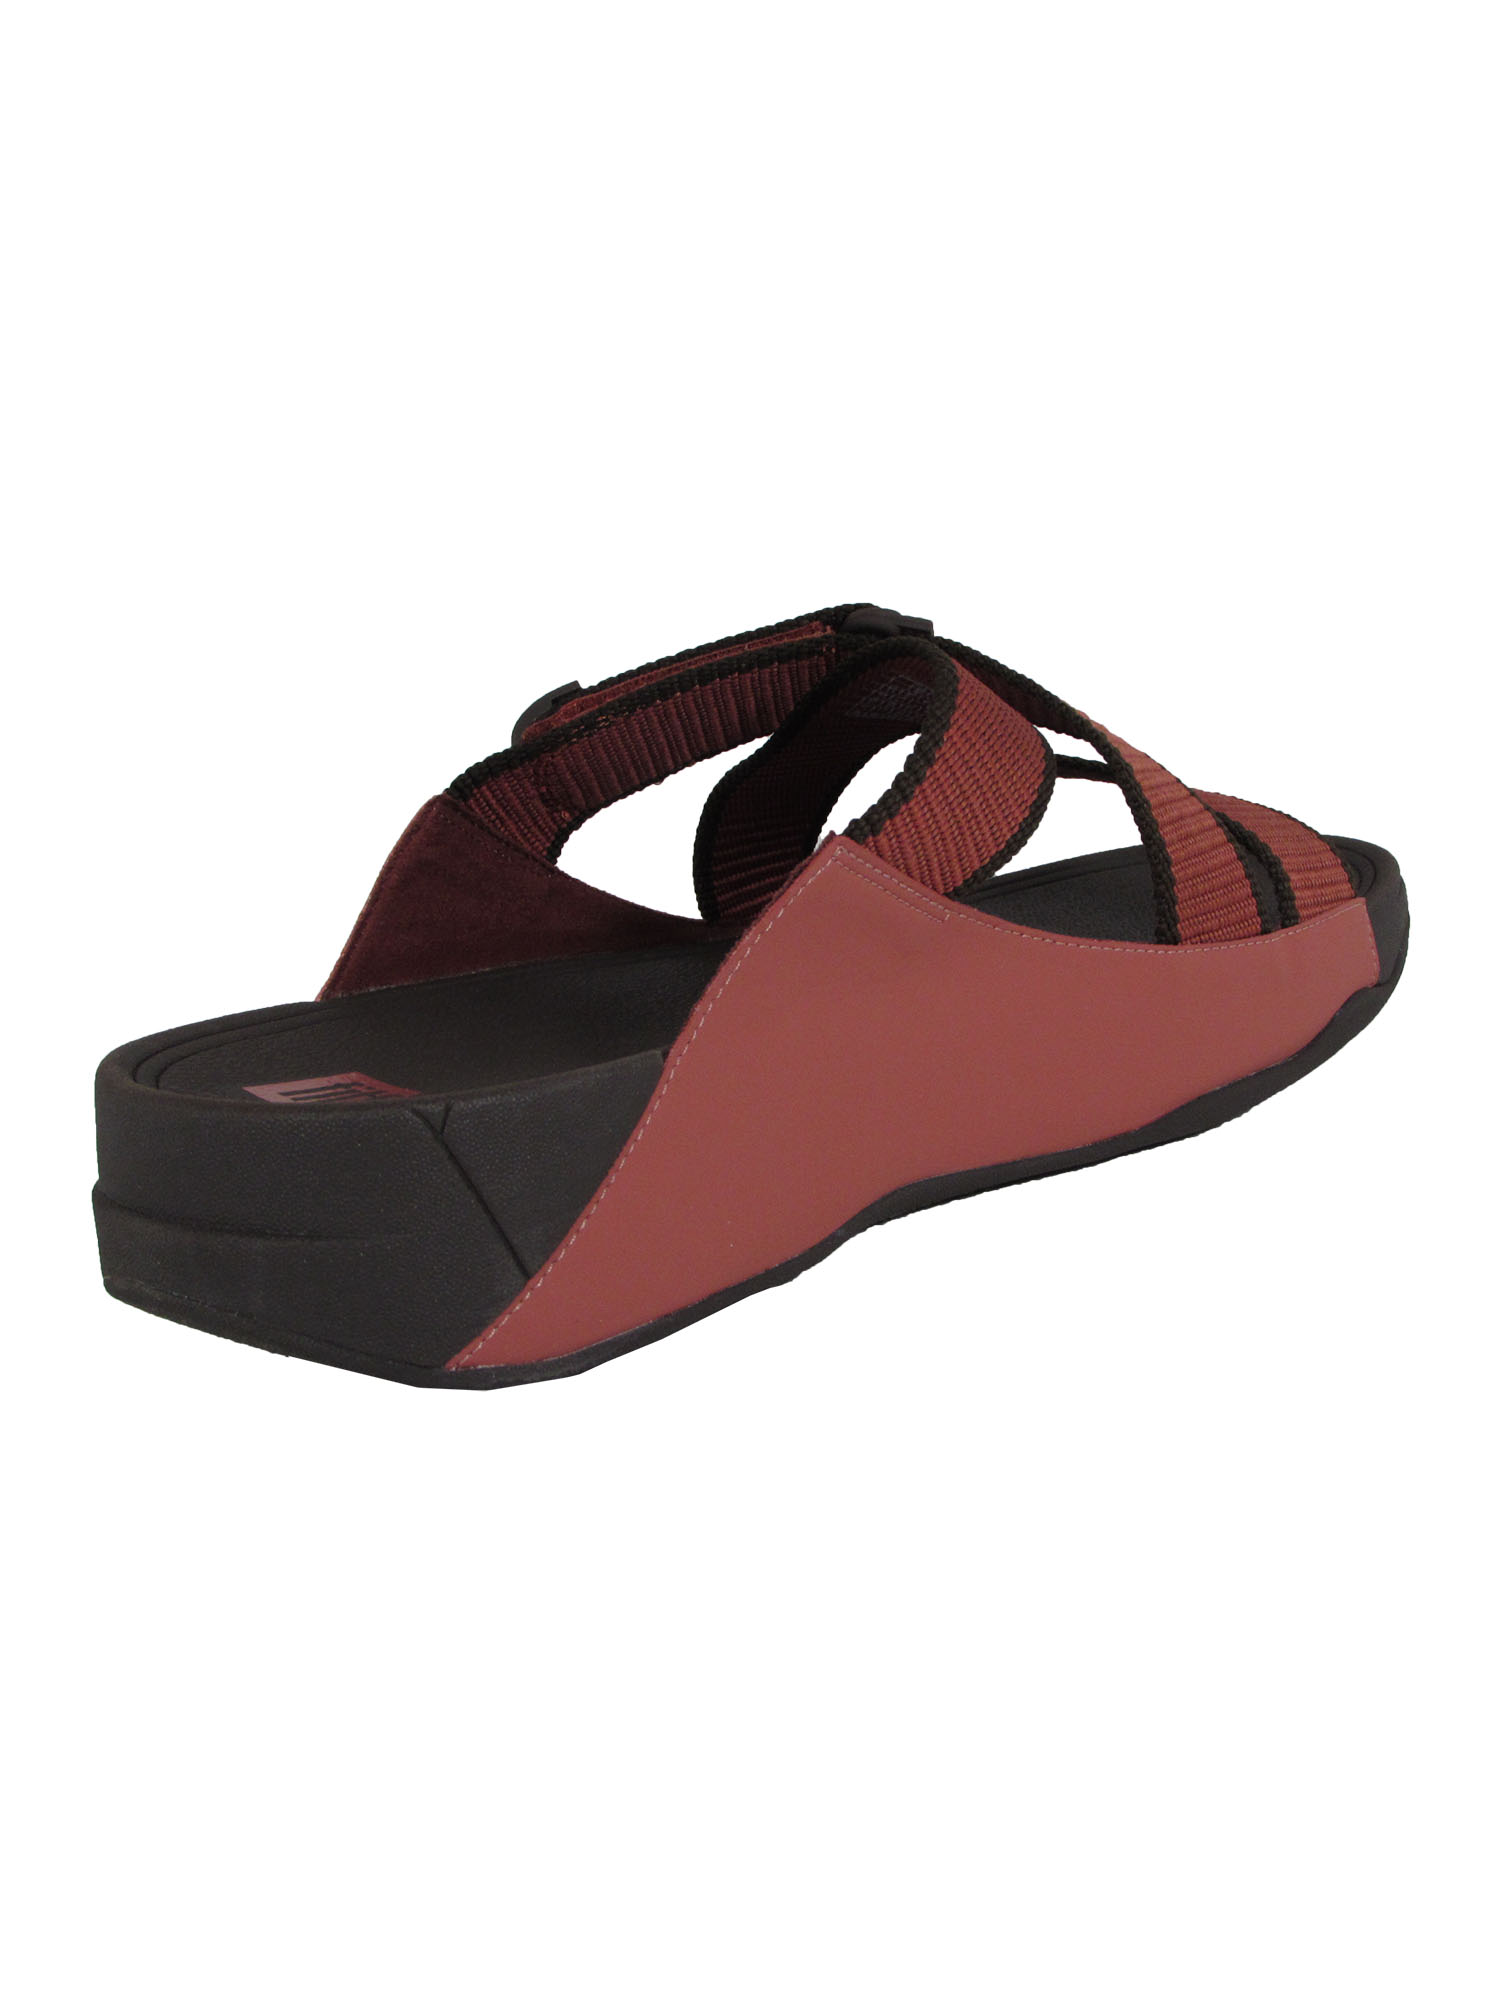 Fitflop-Mens-Sling-II-Webbing-Slide-Sandal-Shoes thumbnail 7